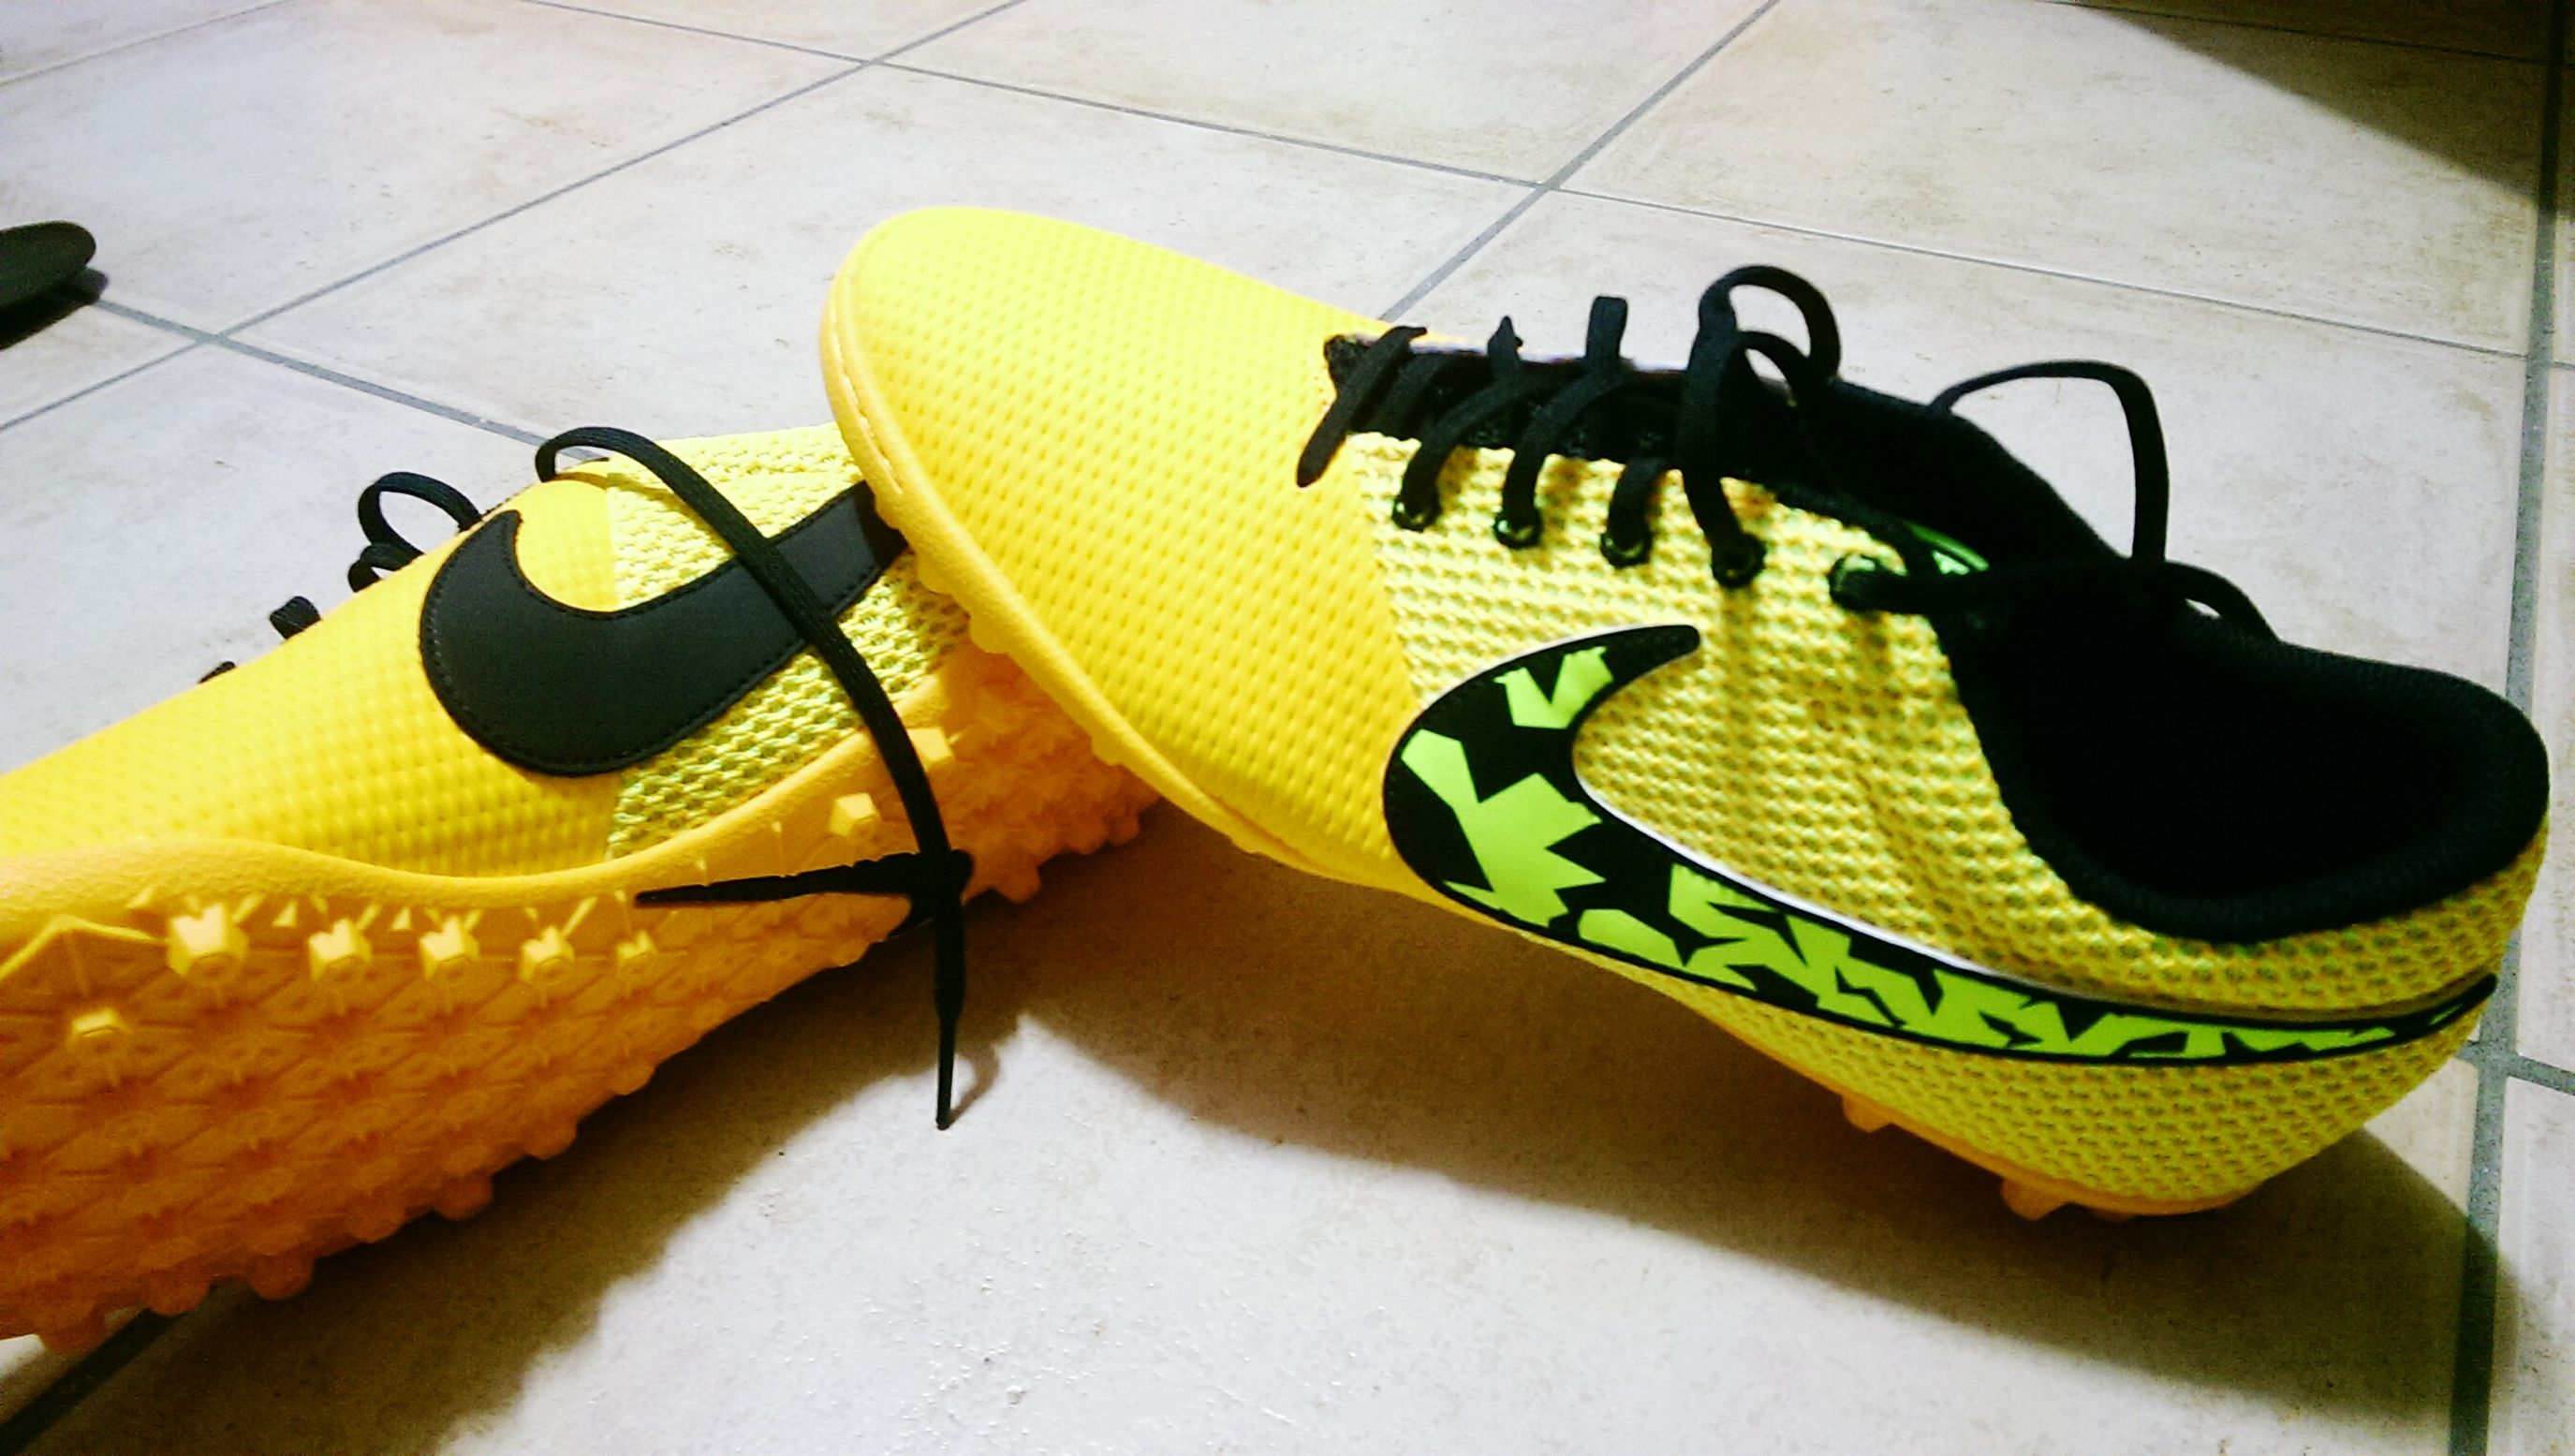 NikeElasticoproIII Football